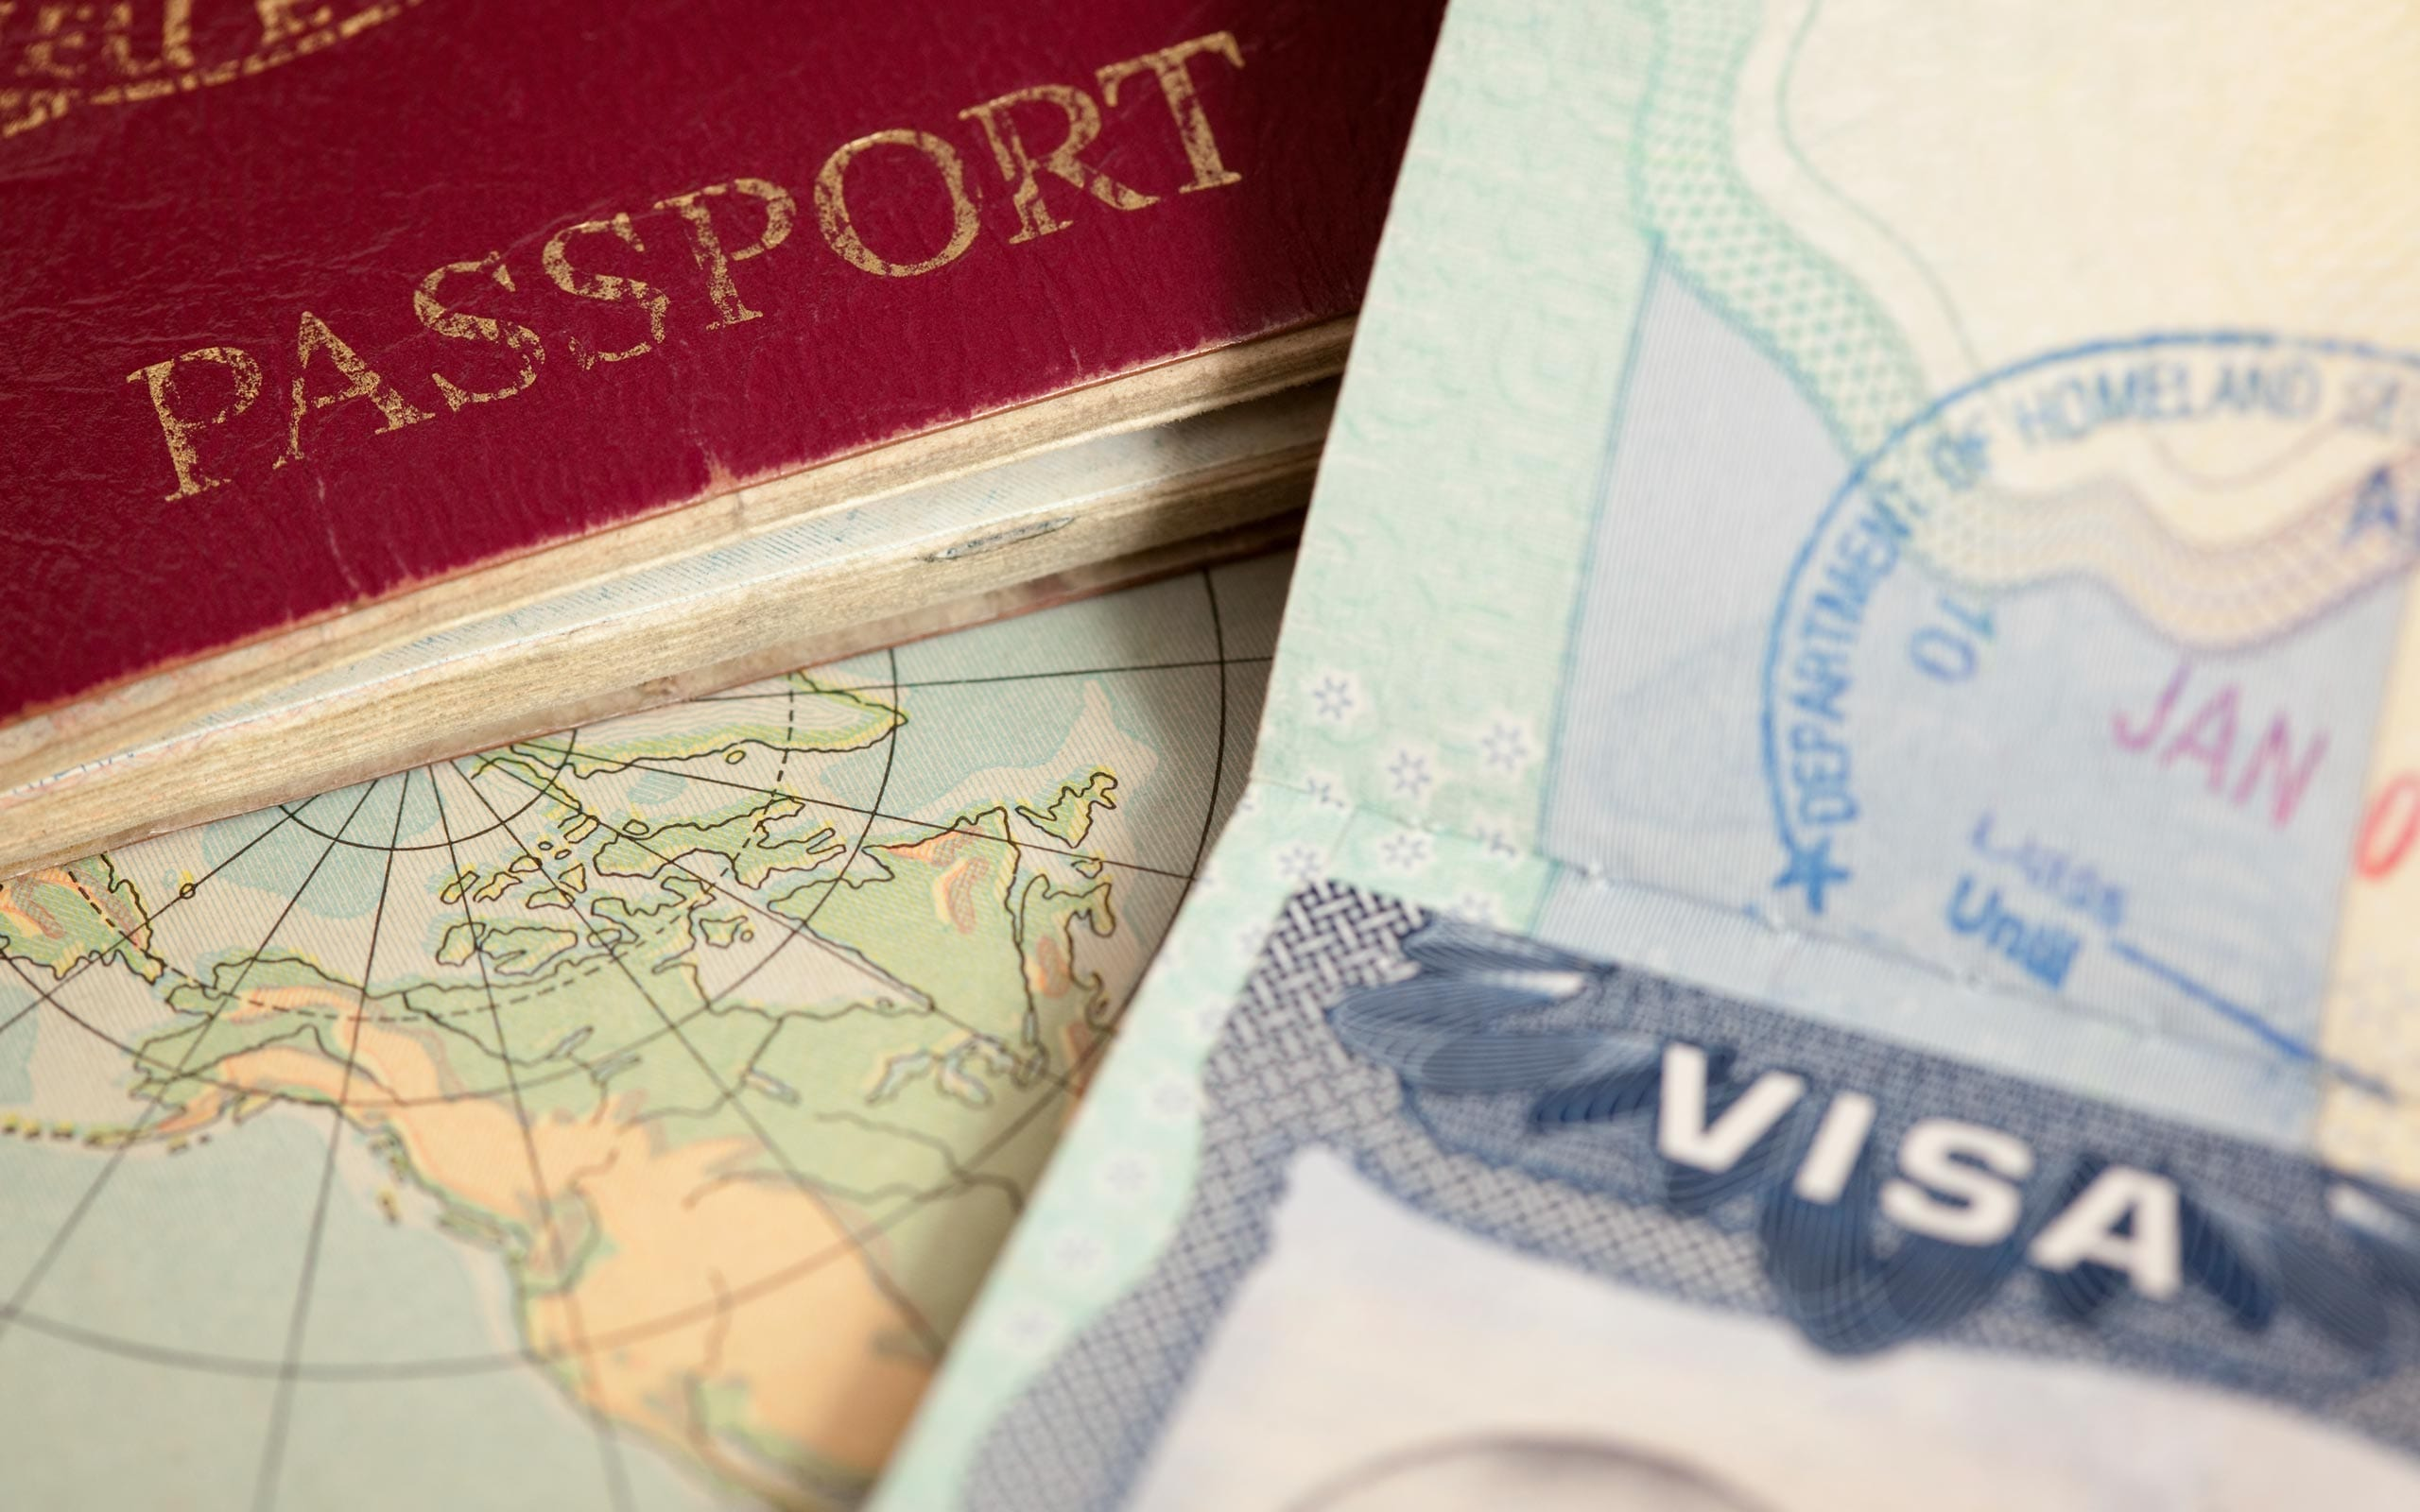 US visa, vintage map and passport background